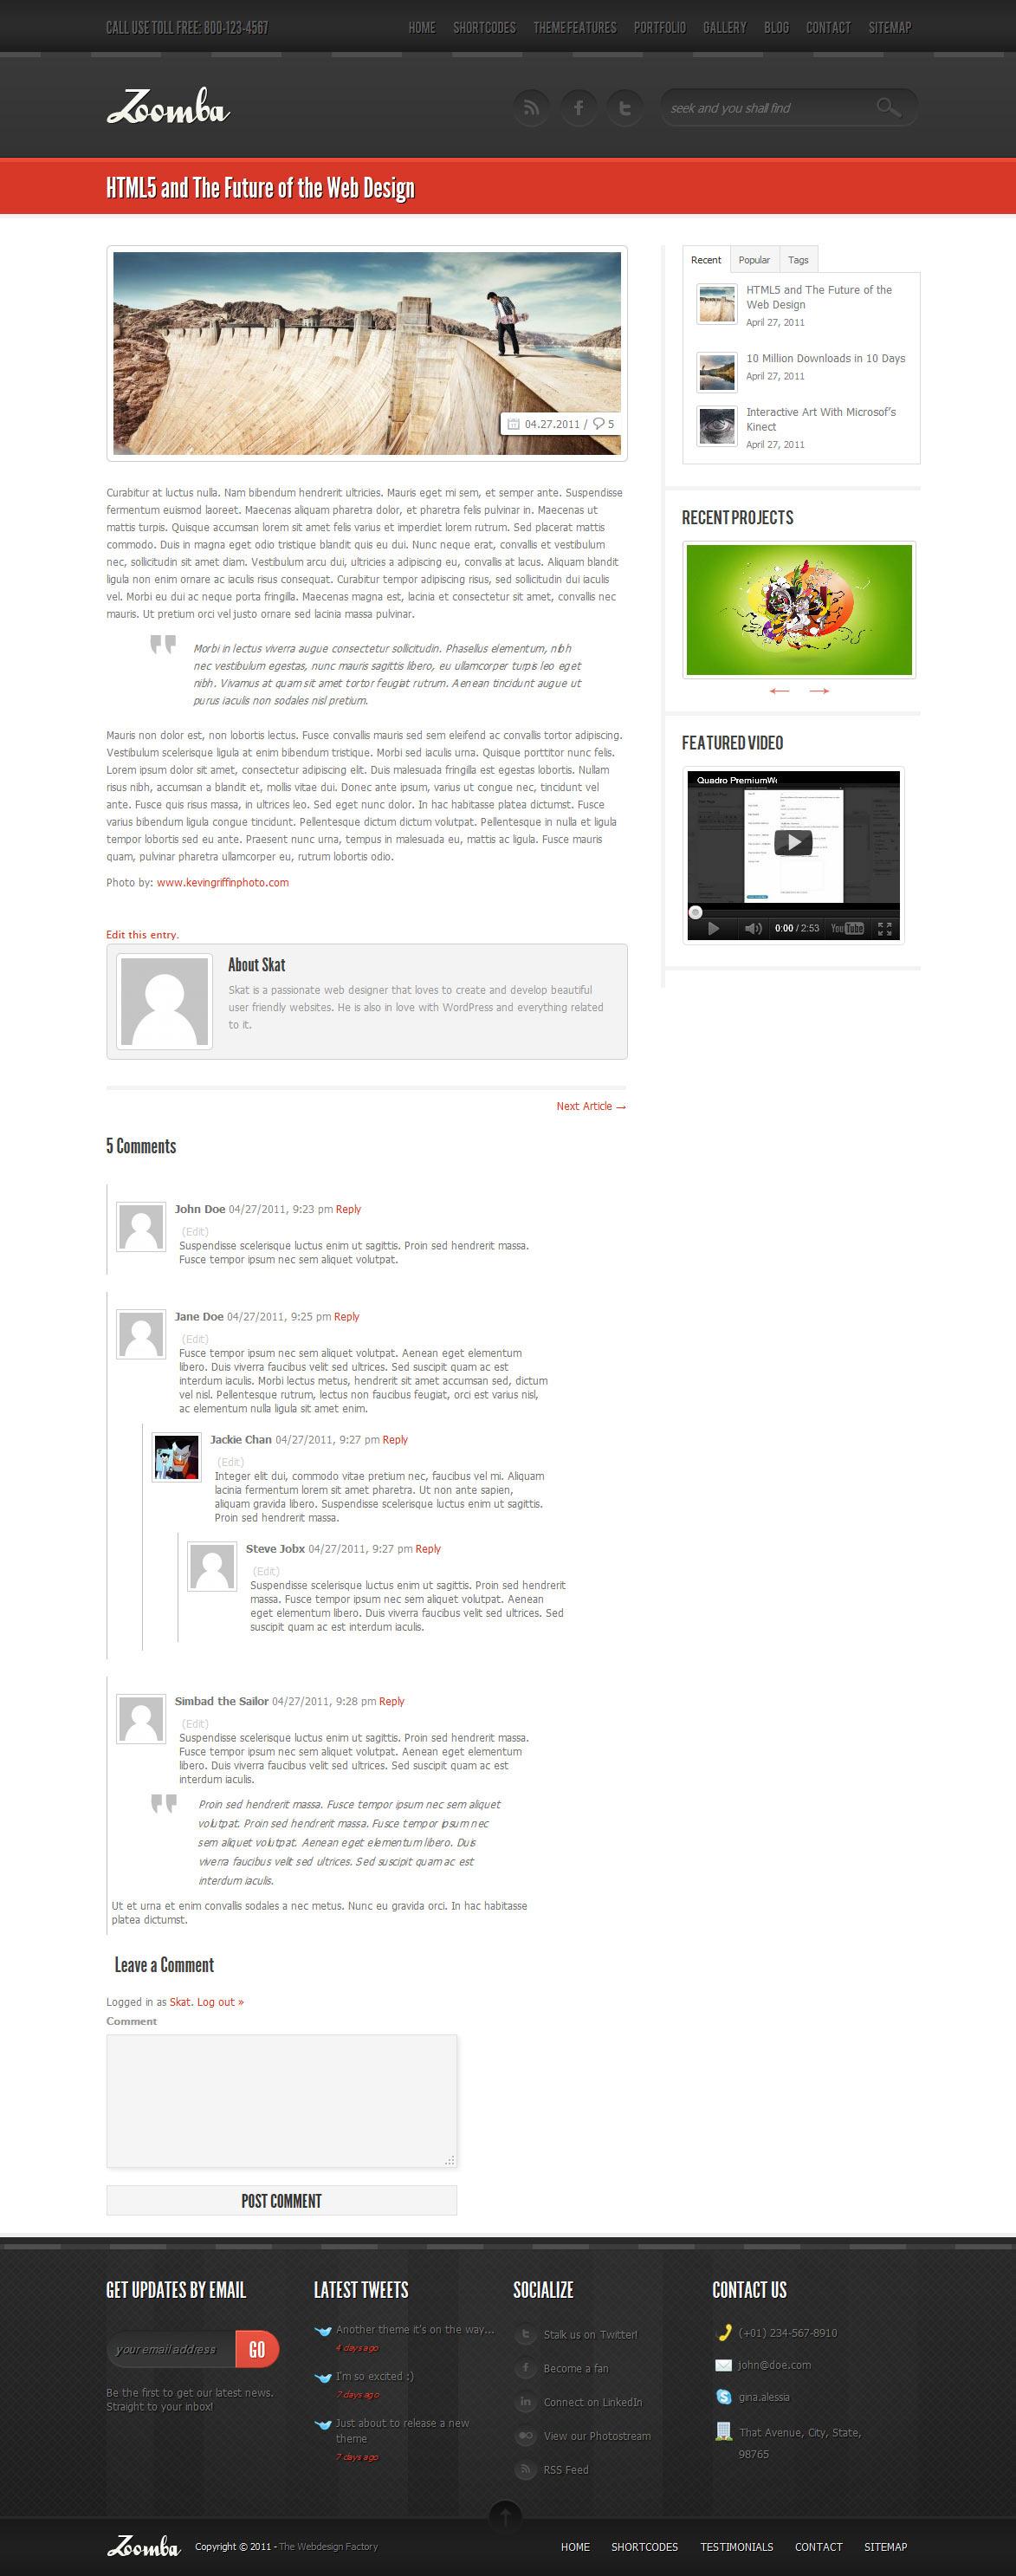 Zoomba - Business/Portfolio WordPress Theme